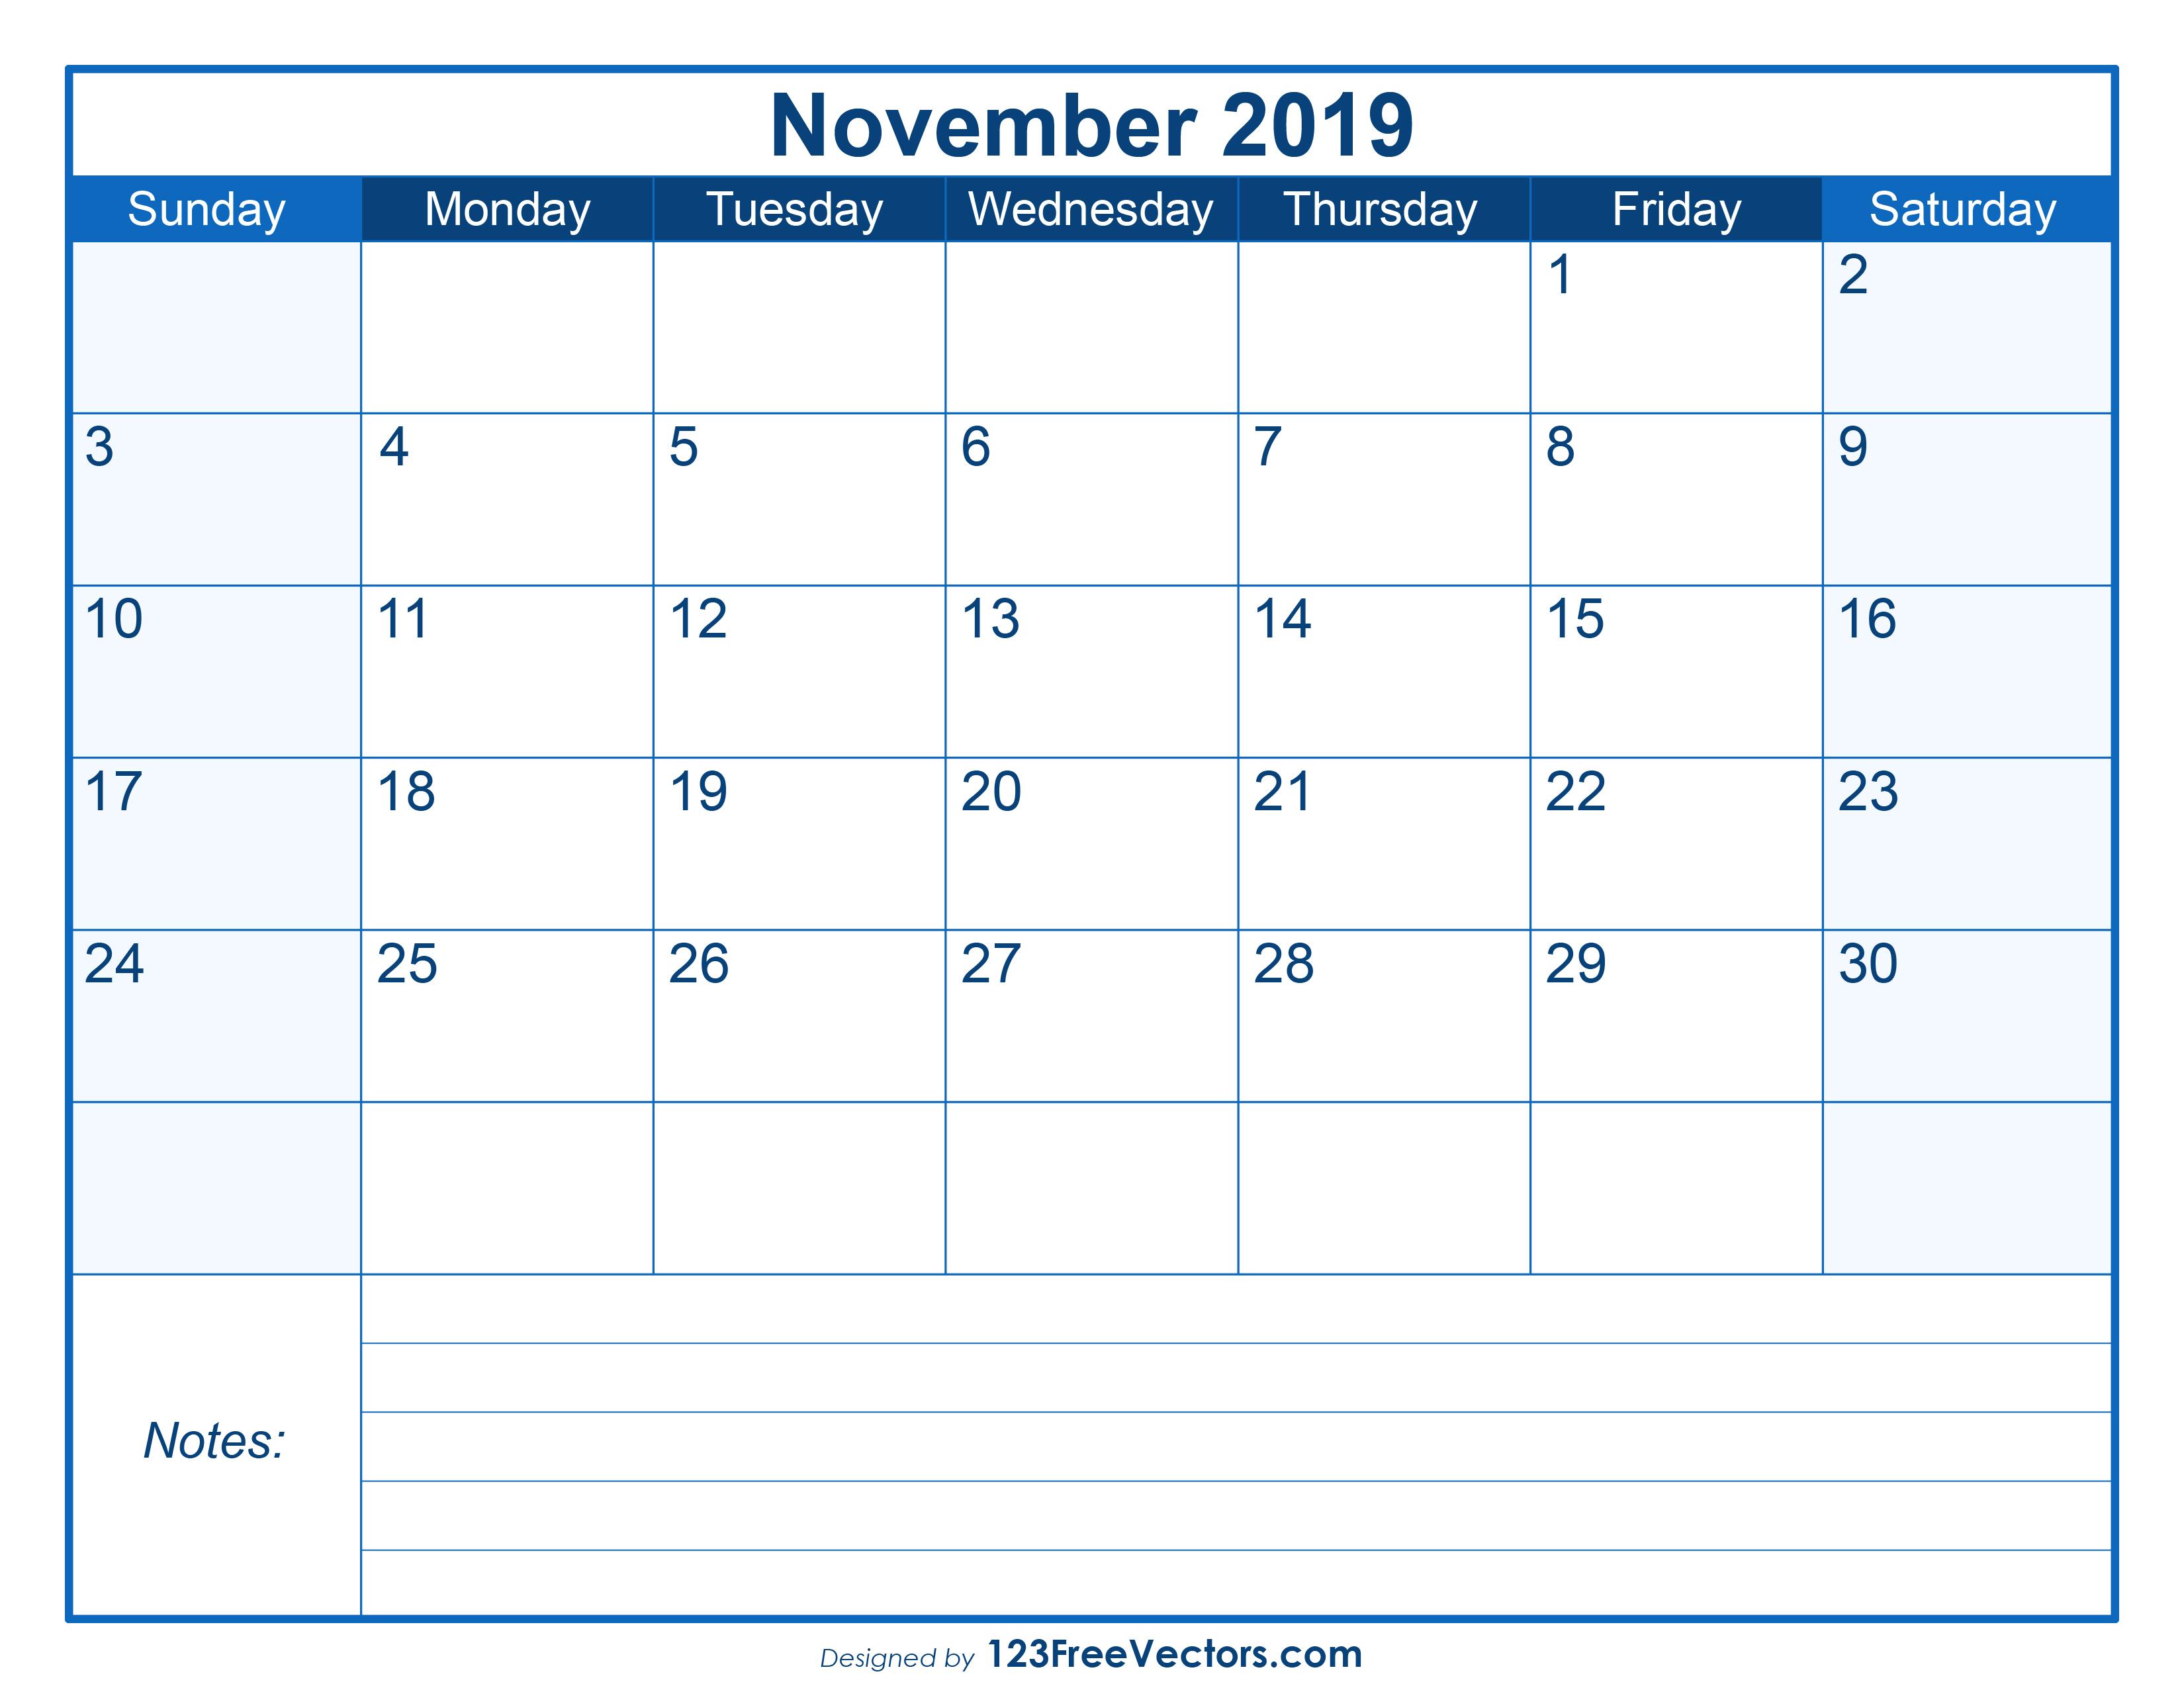 image regarding Blank November Calendar Printable referred to as Blank Printable November Calendar 2019